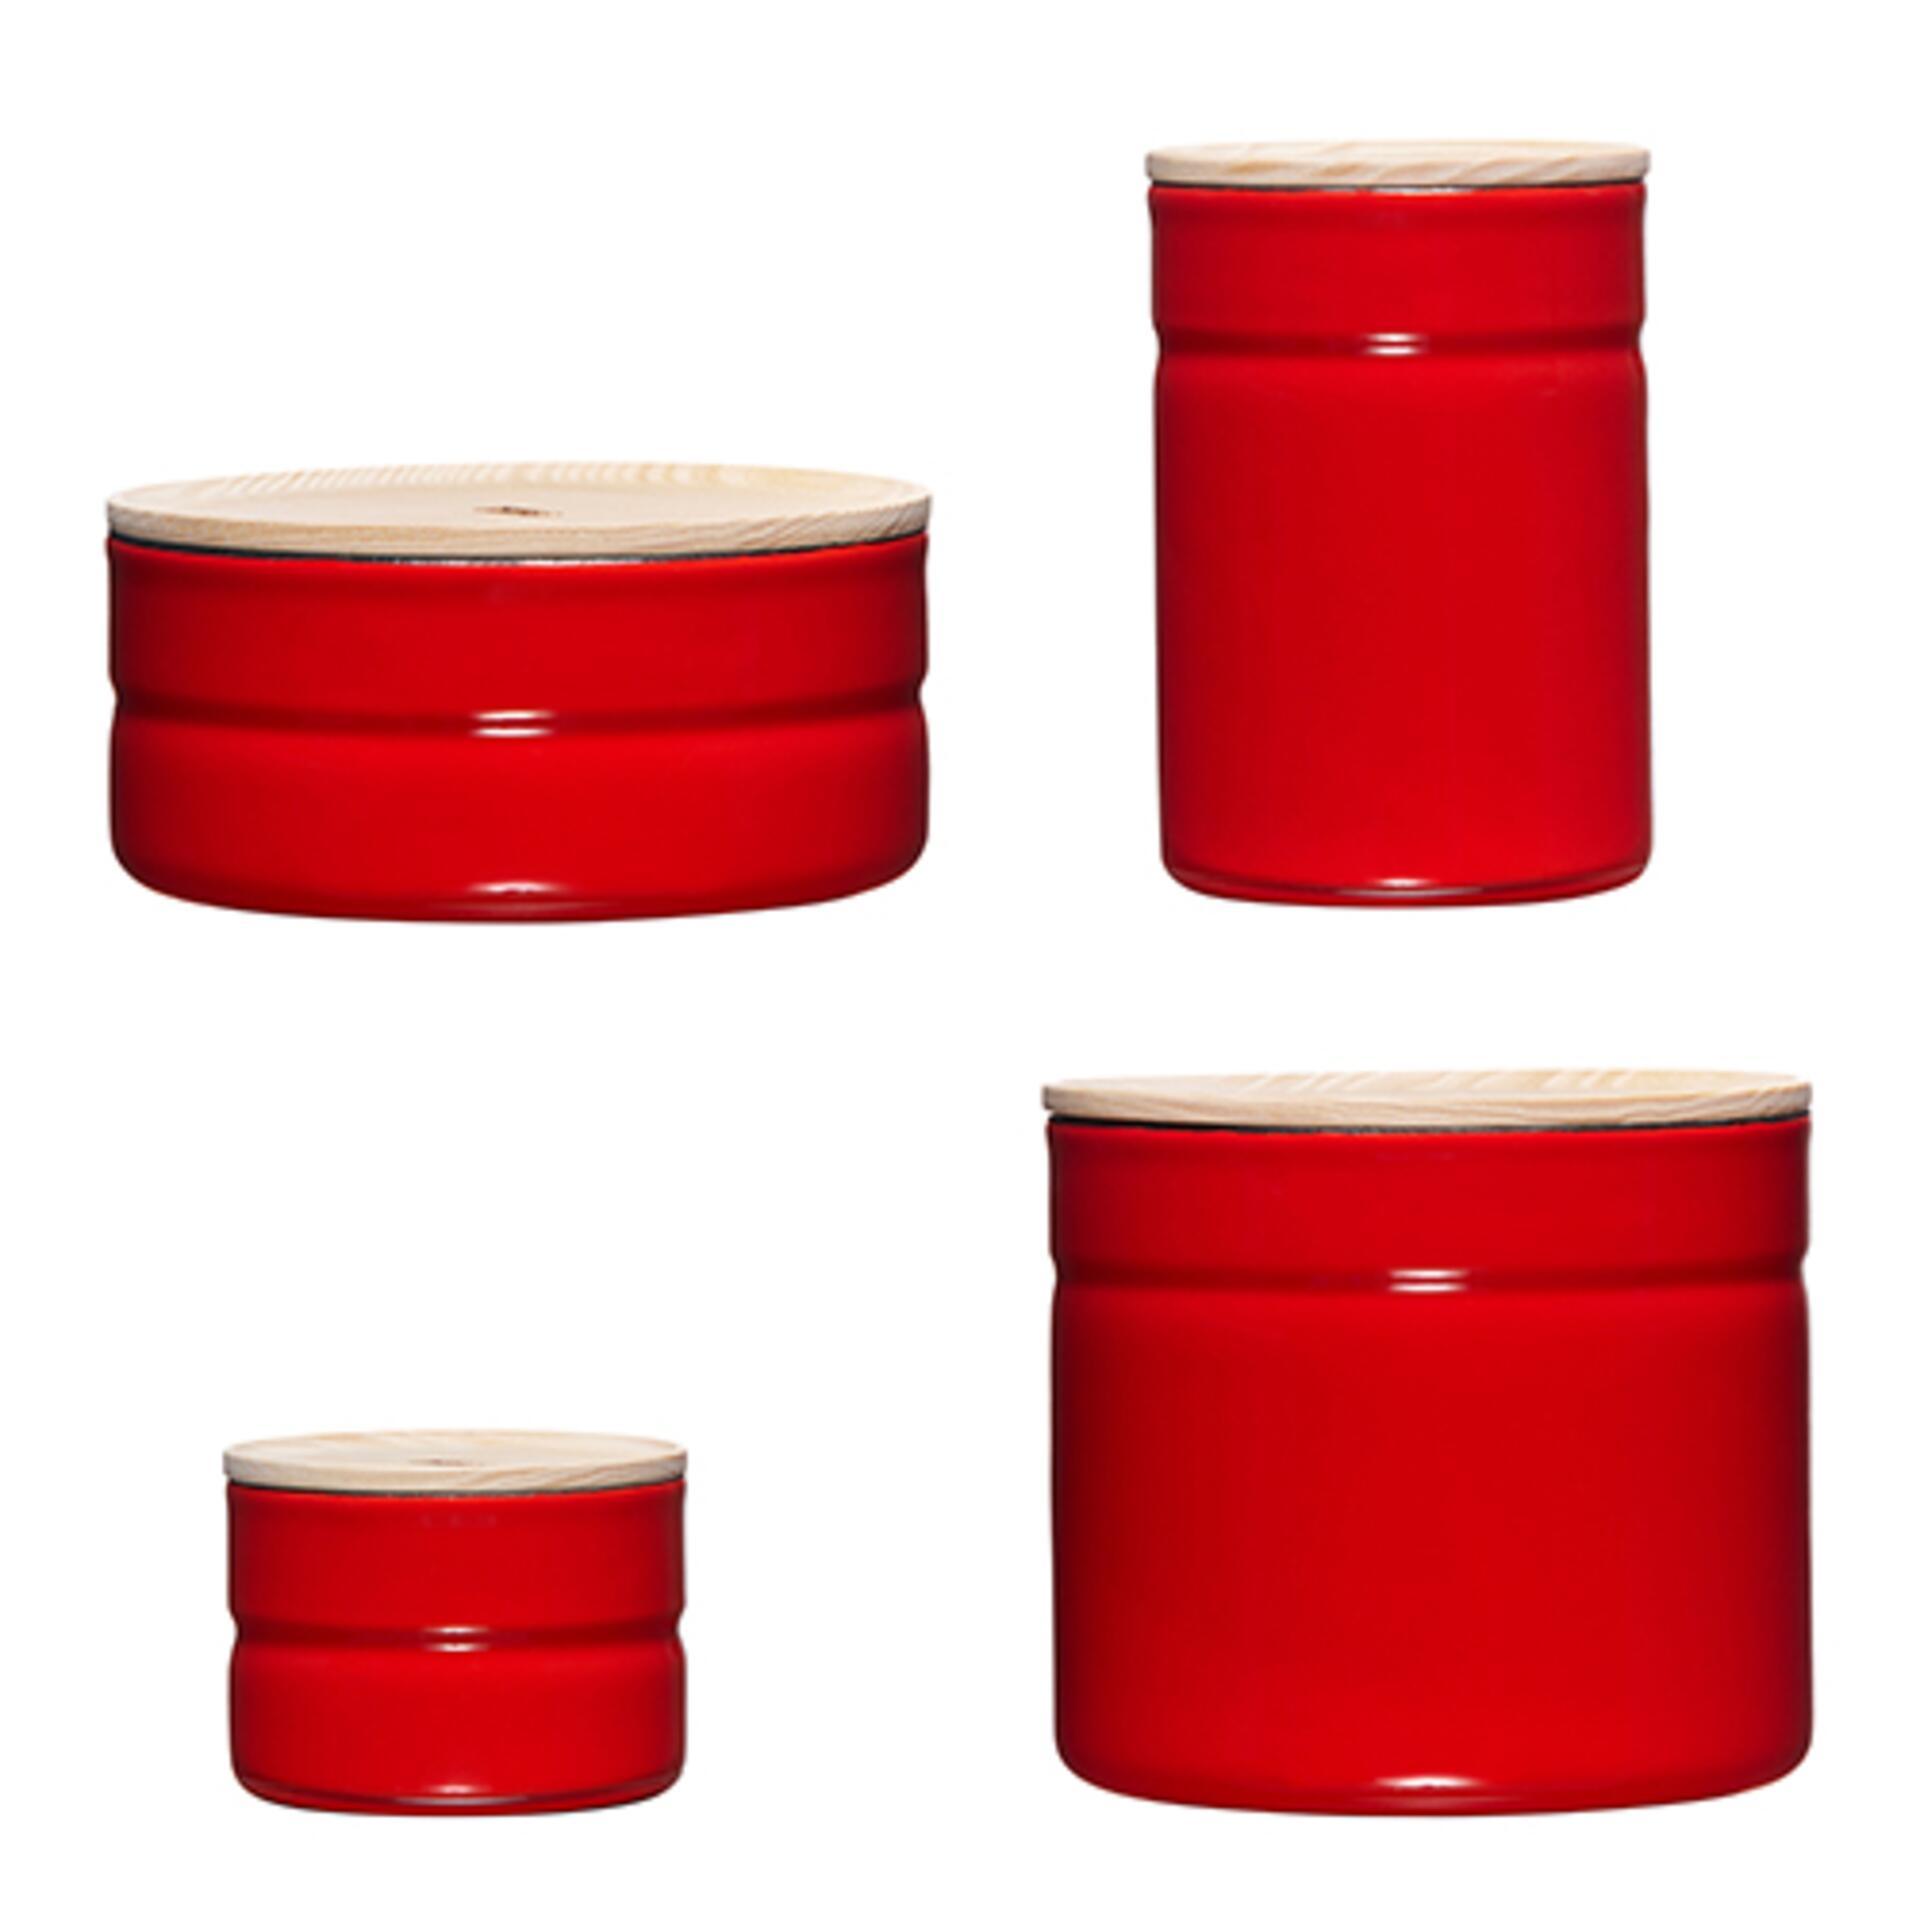 Riess Vorratsdosen Set Rot